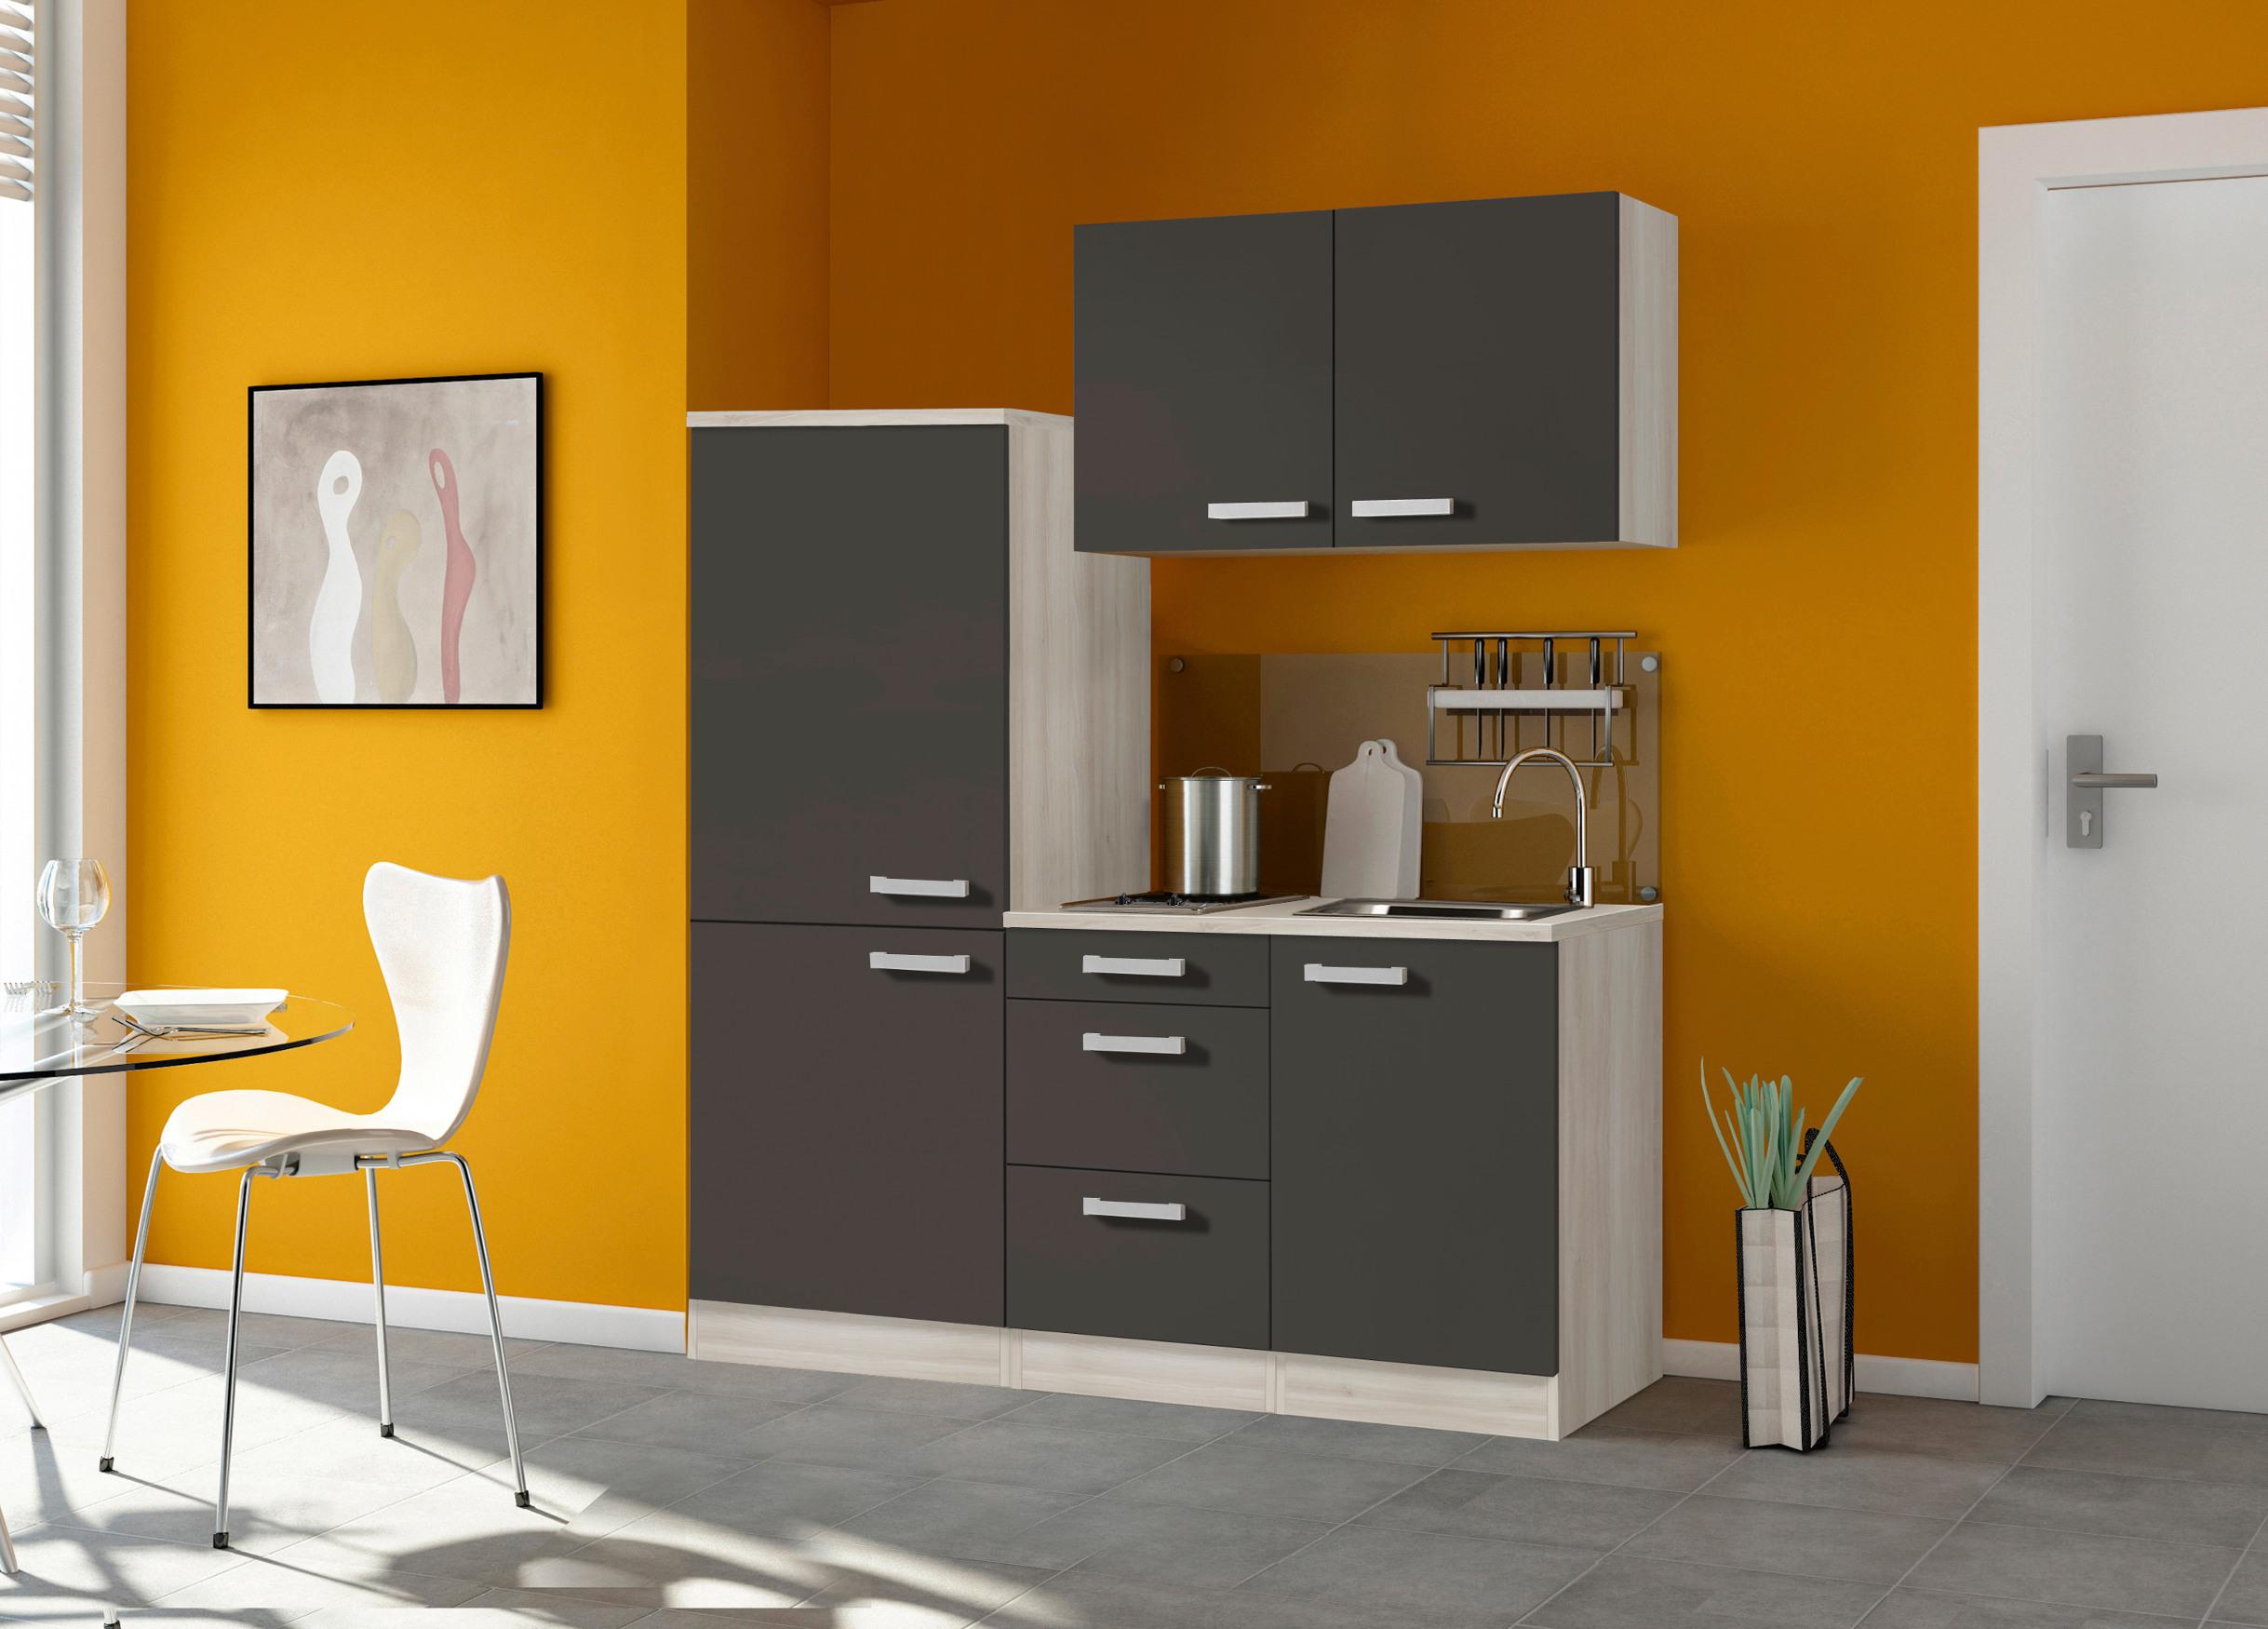 singlek che barcelona mit glaskermik kochfeld breite 160 cm grau k che singlek chen. Black Bedroom Furniture Sets. Home Design Ideas